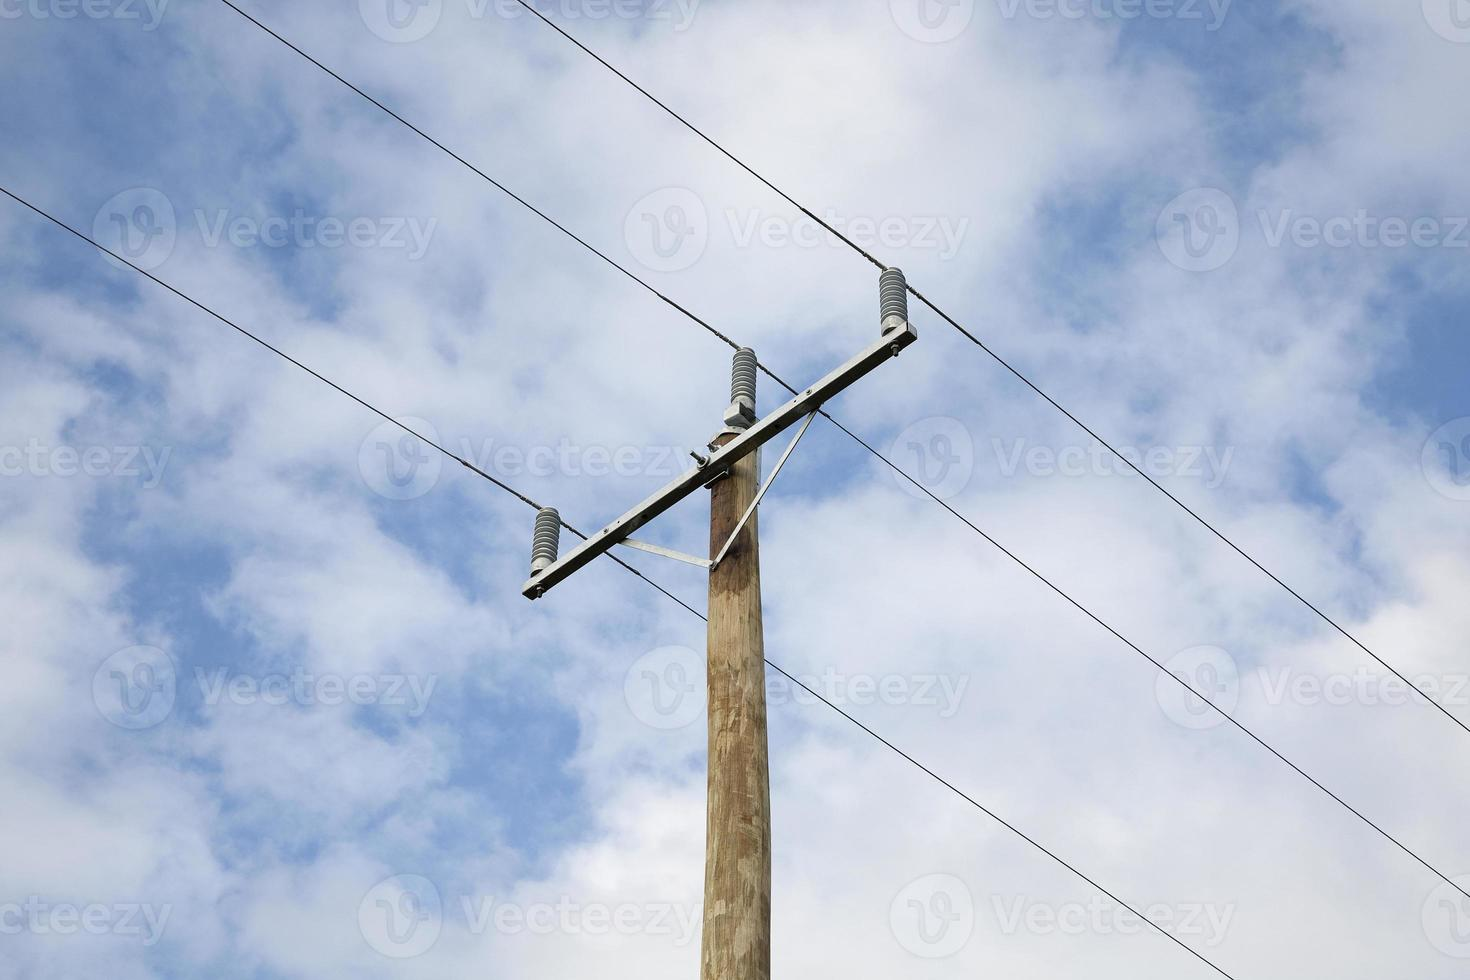 linee elettriche foto